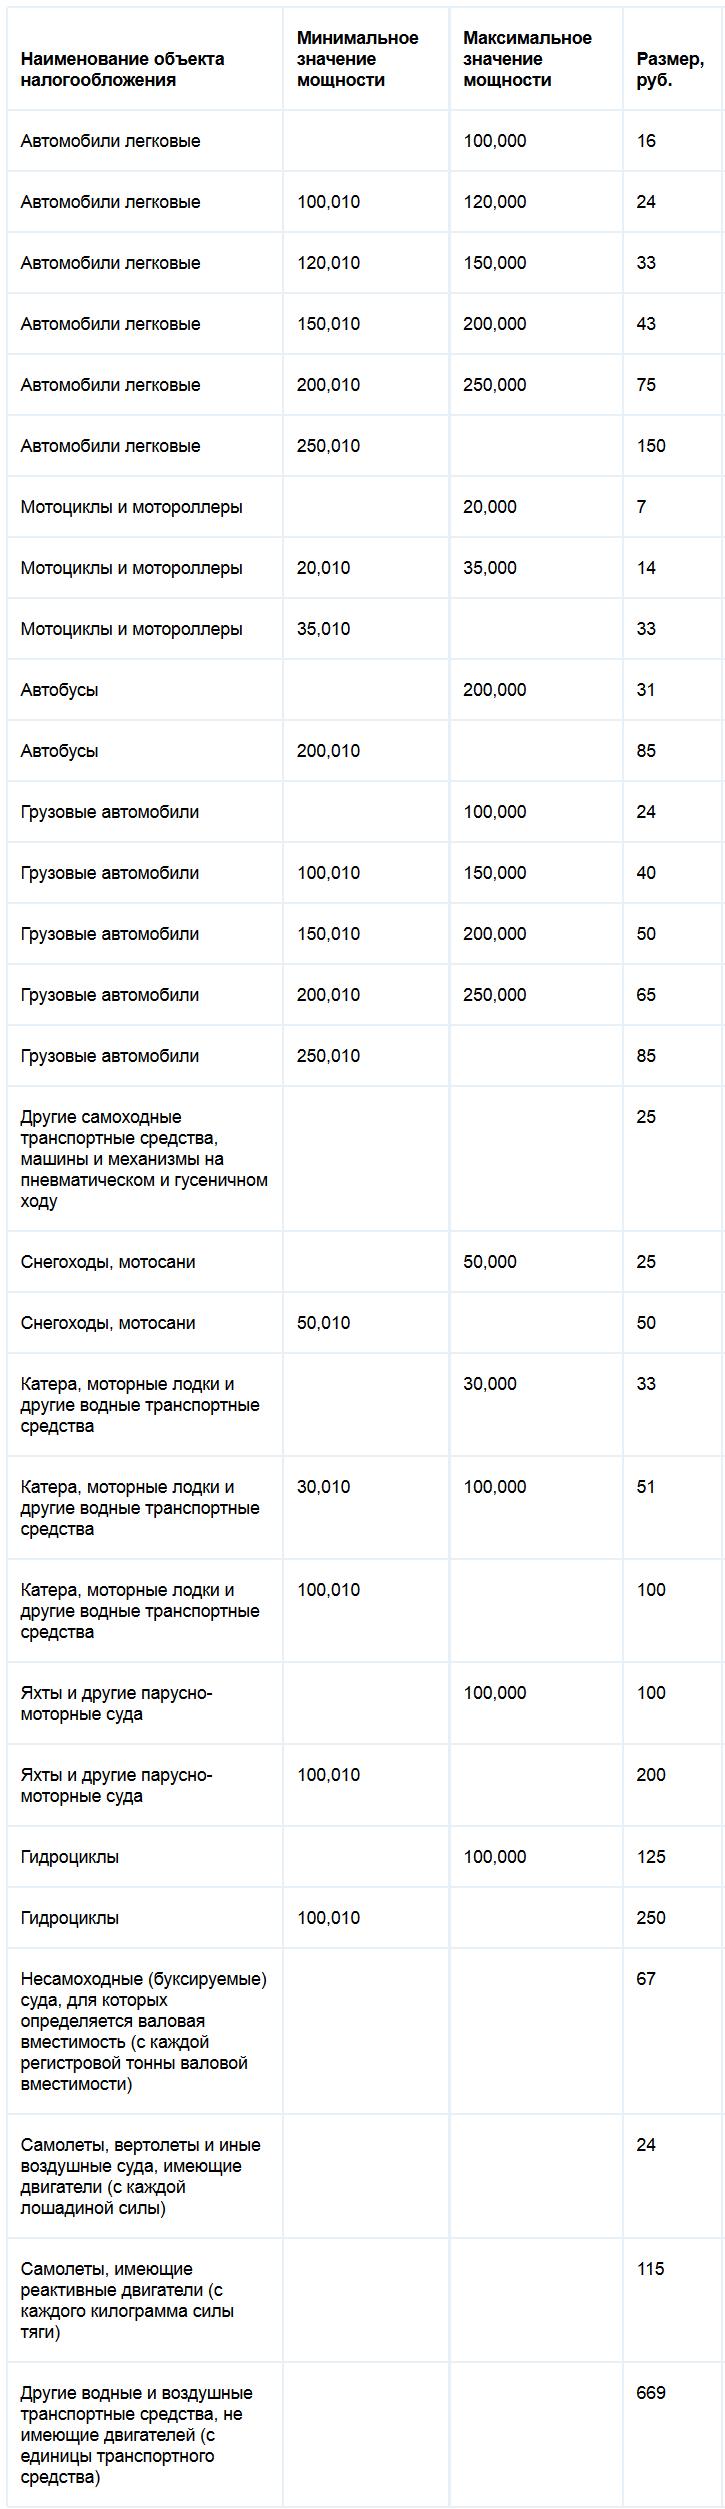 Ставки транспортного налога Самарской области